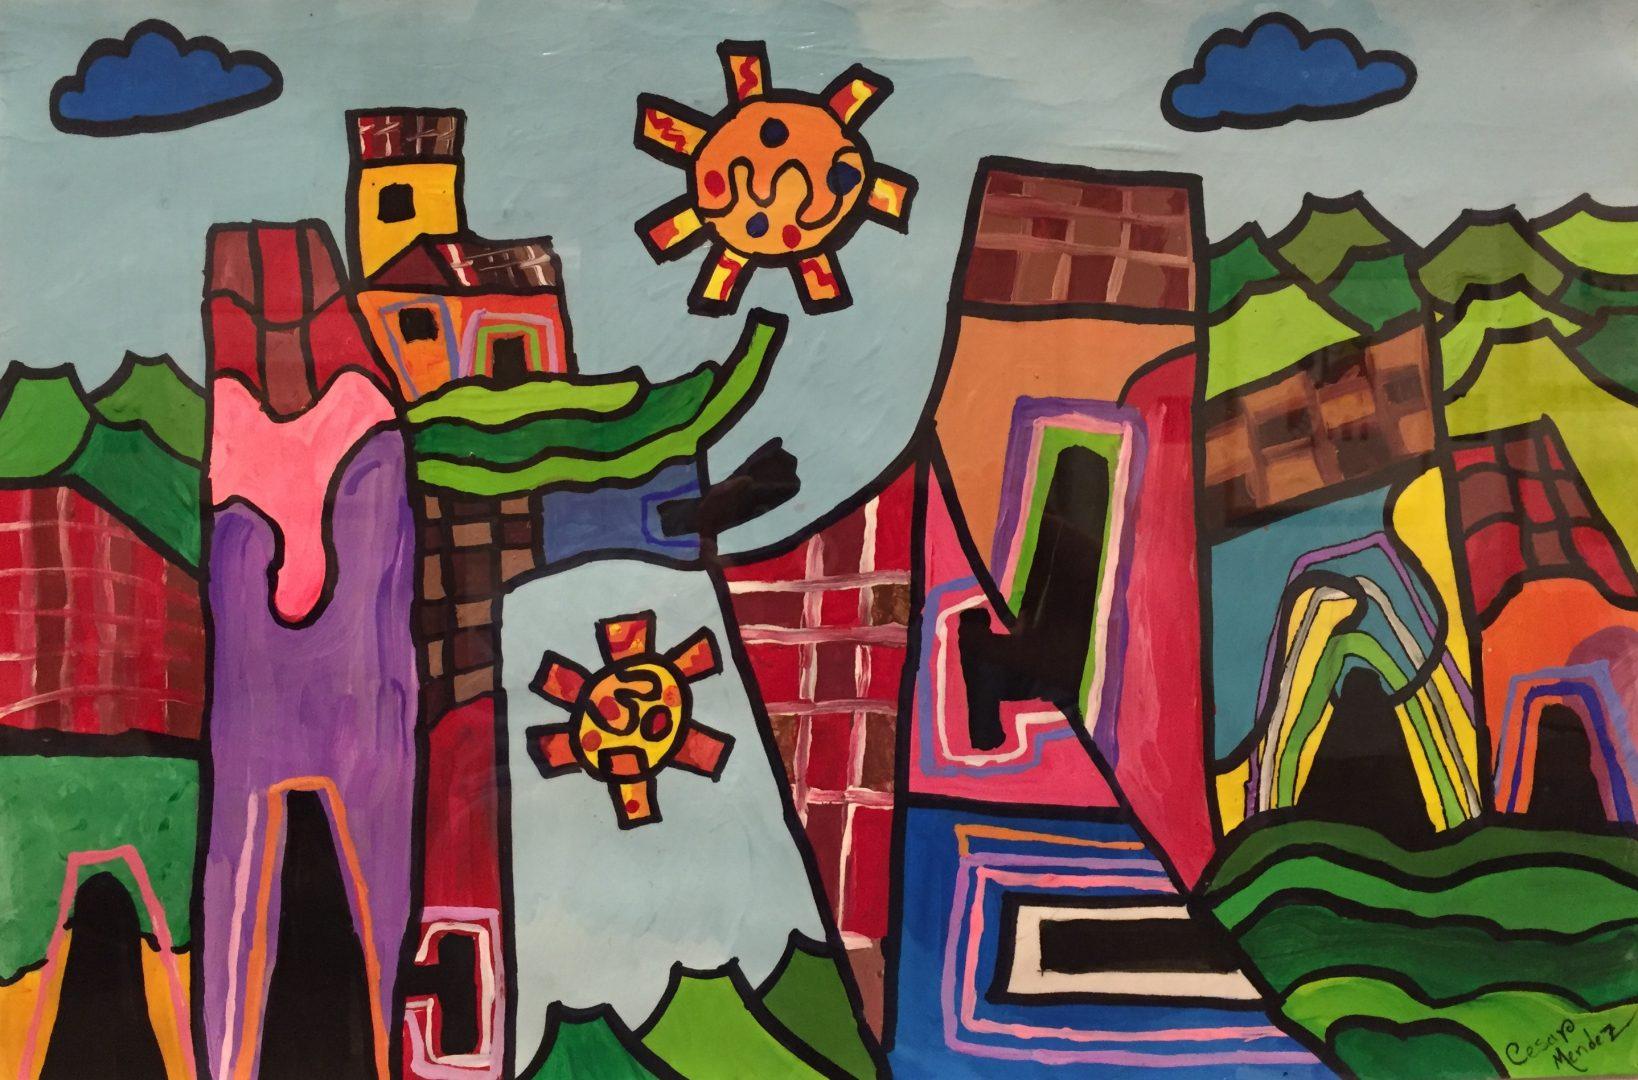 """The Life on the Field"" by Cedar Osvaldo Mendez Portillo"